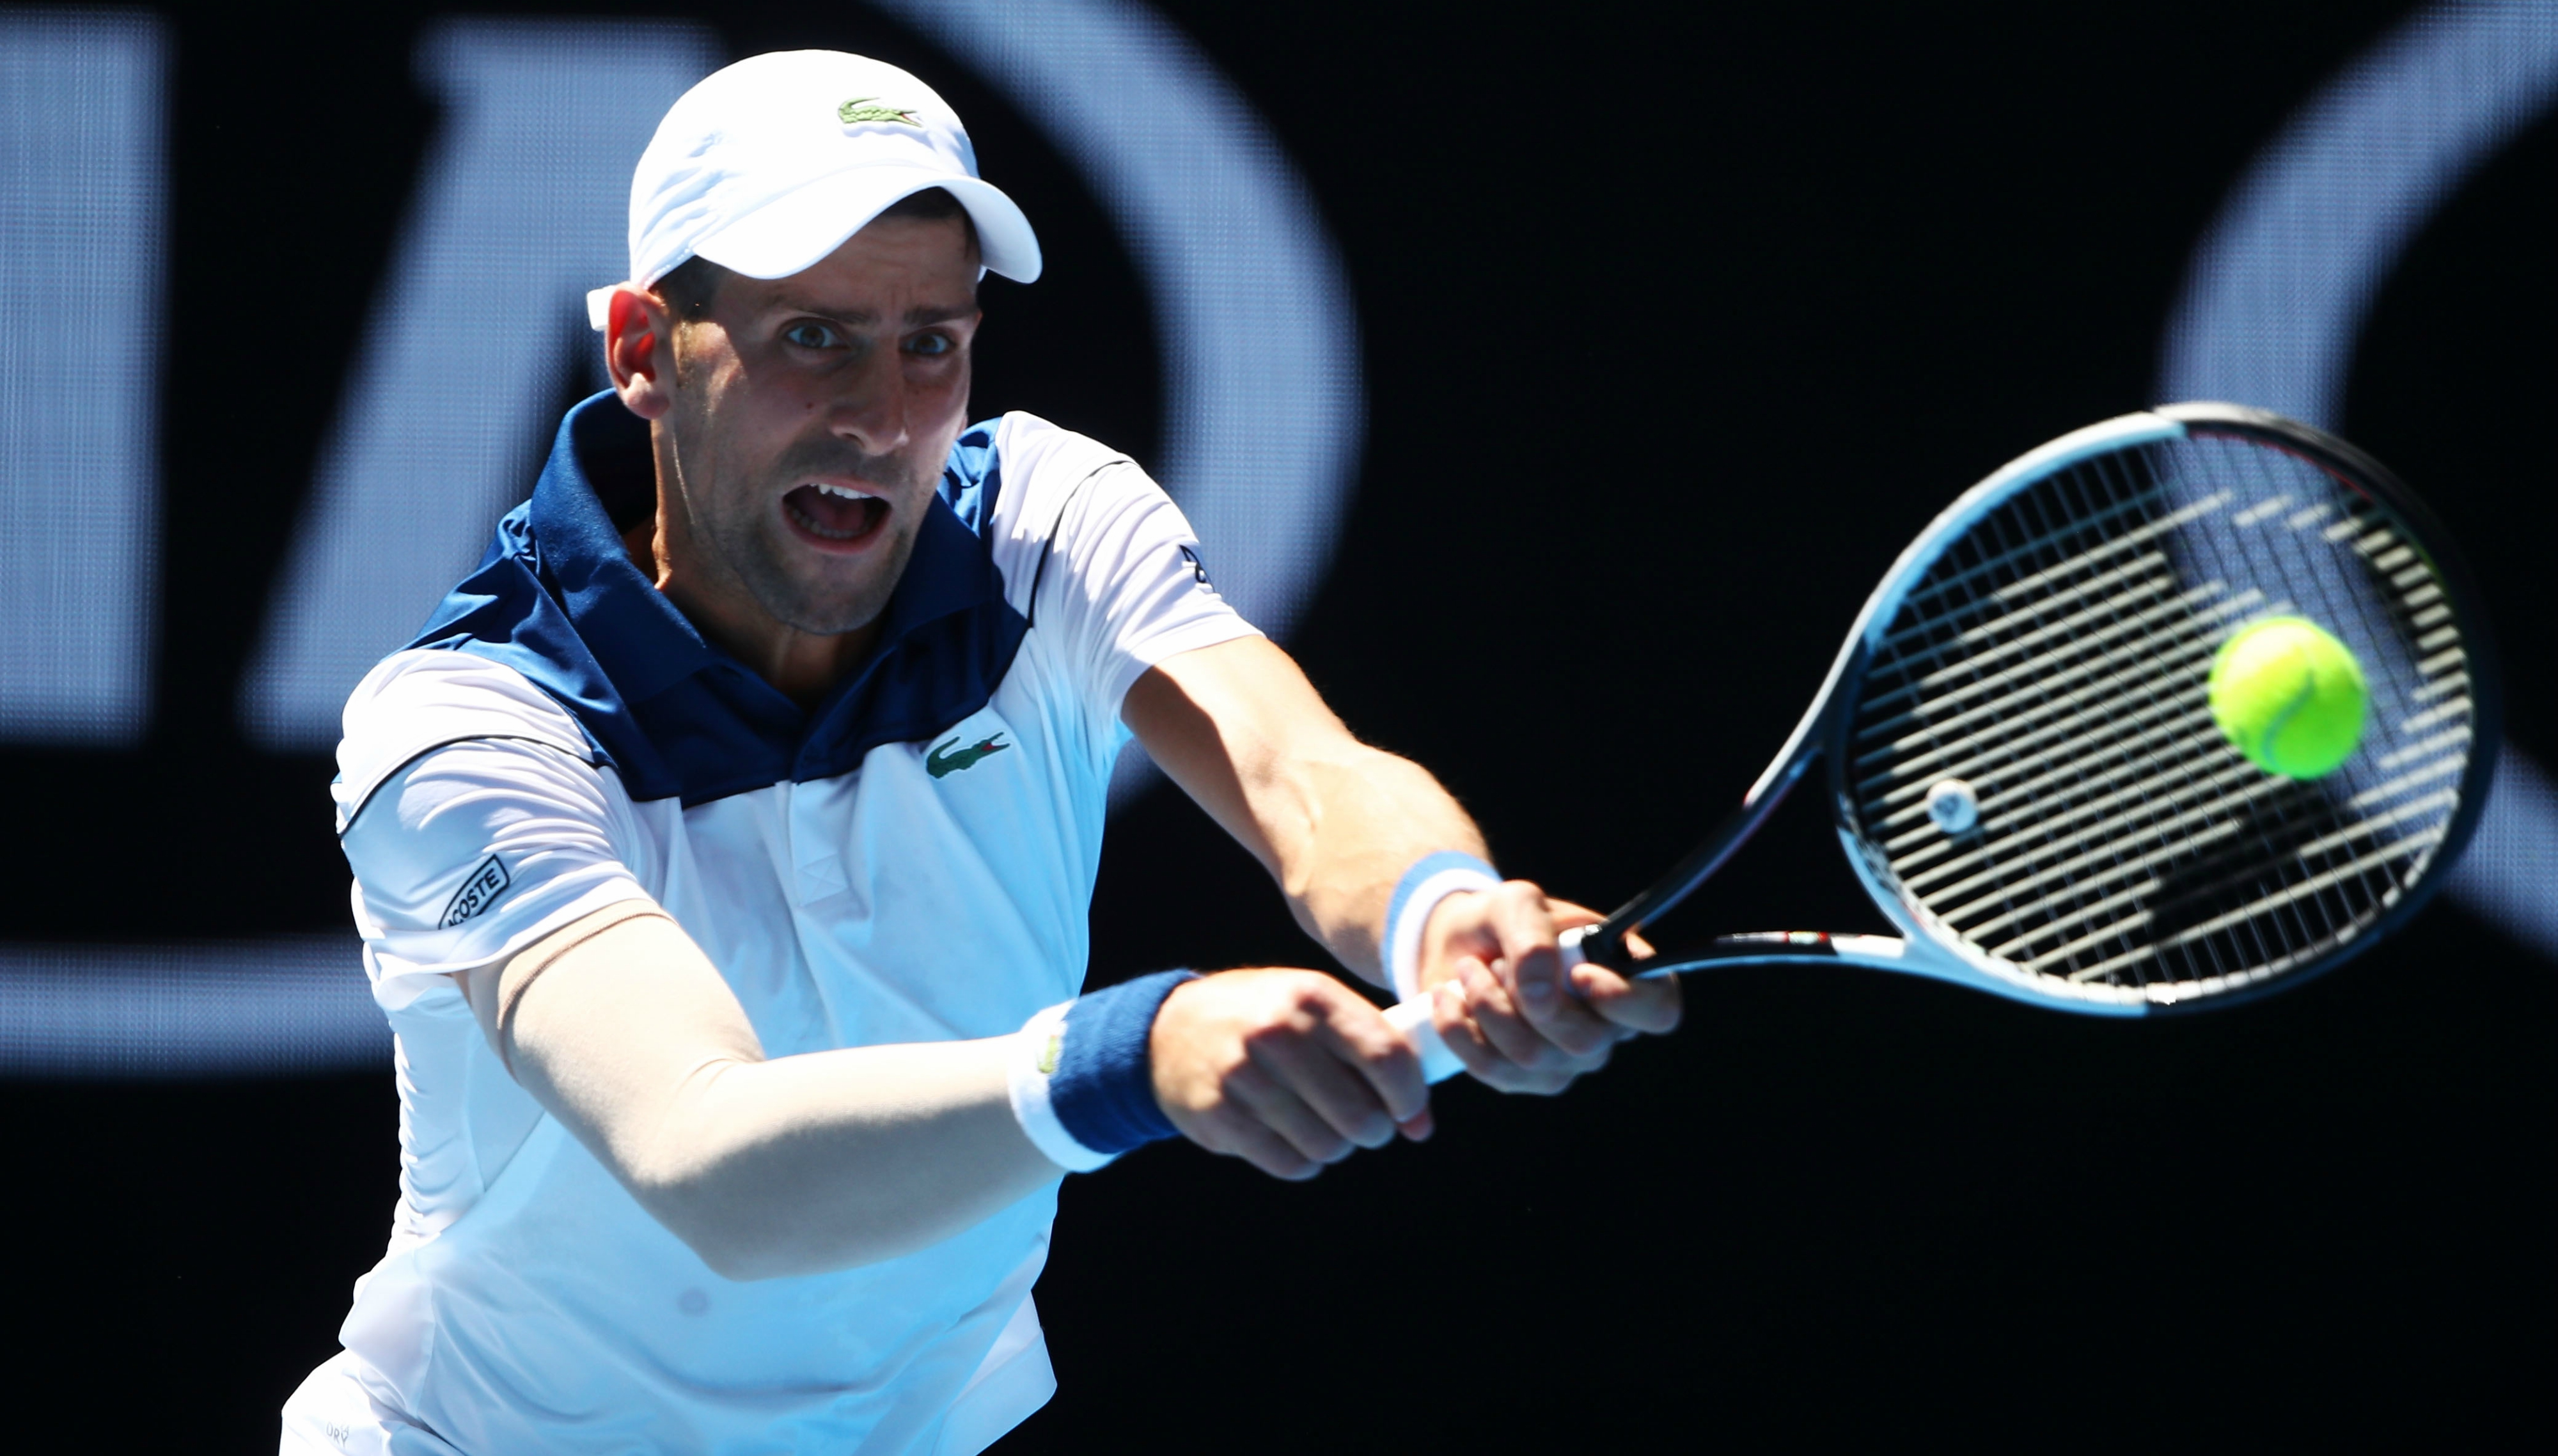 Will Ferrell Hilariously Interviews Roger Federer At Australian Open